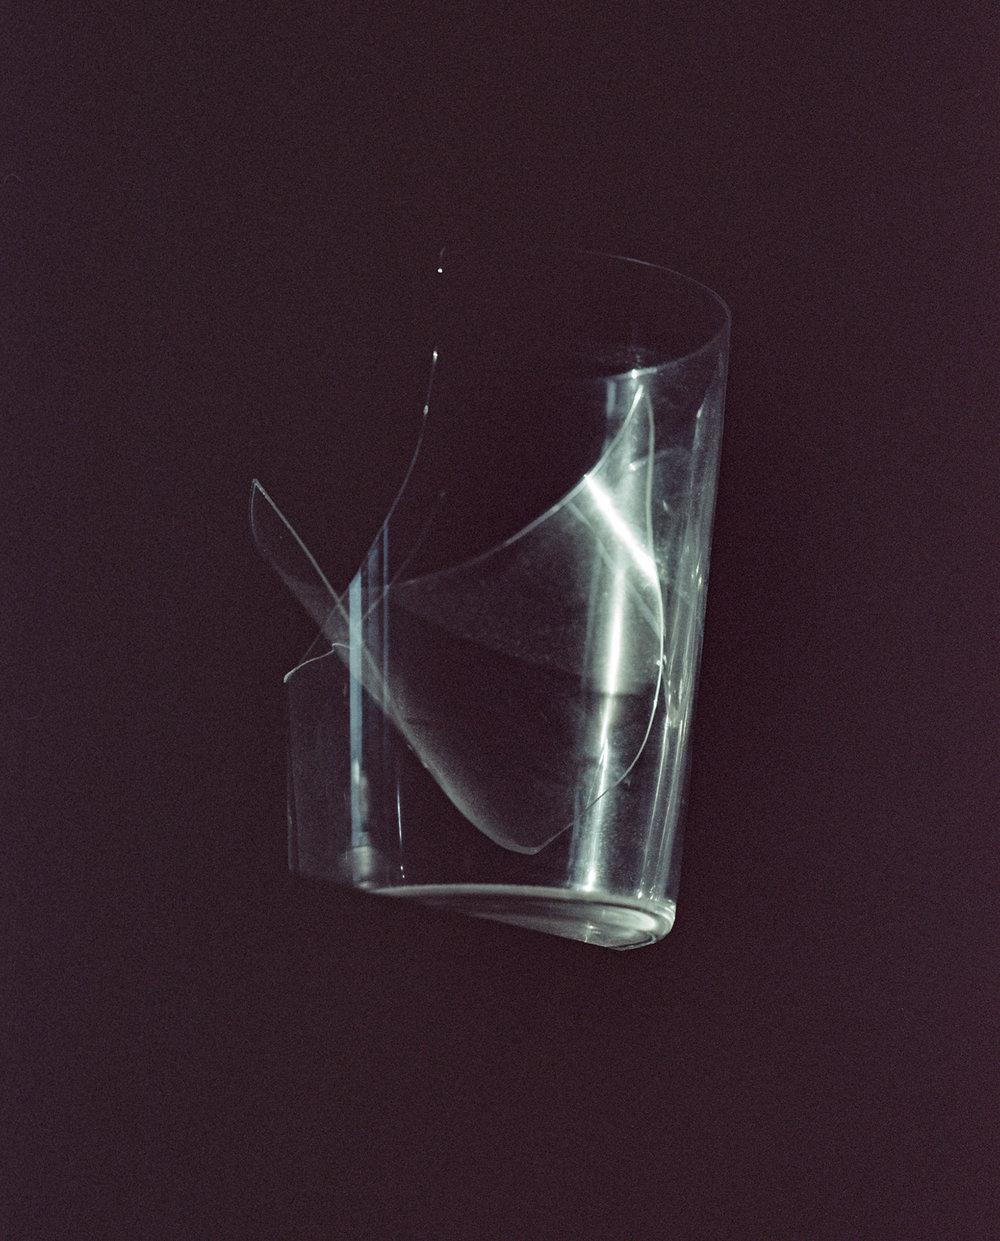 Broken Glass #59